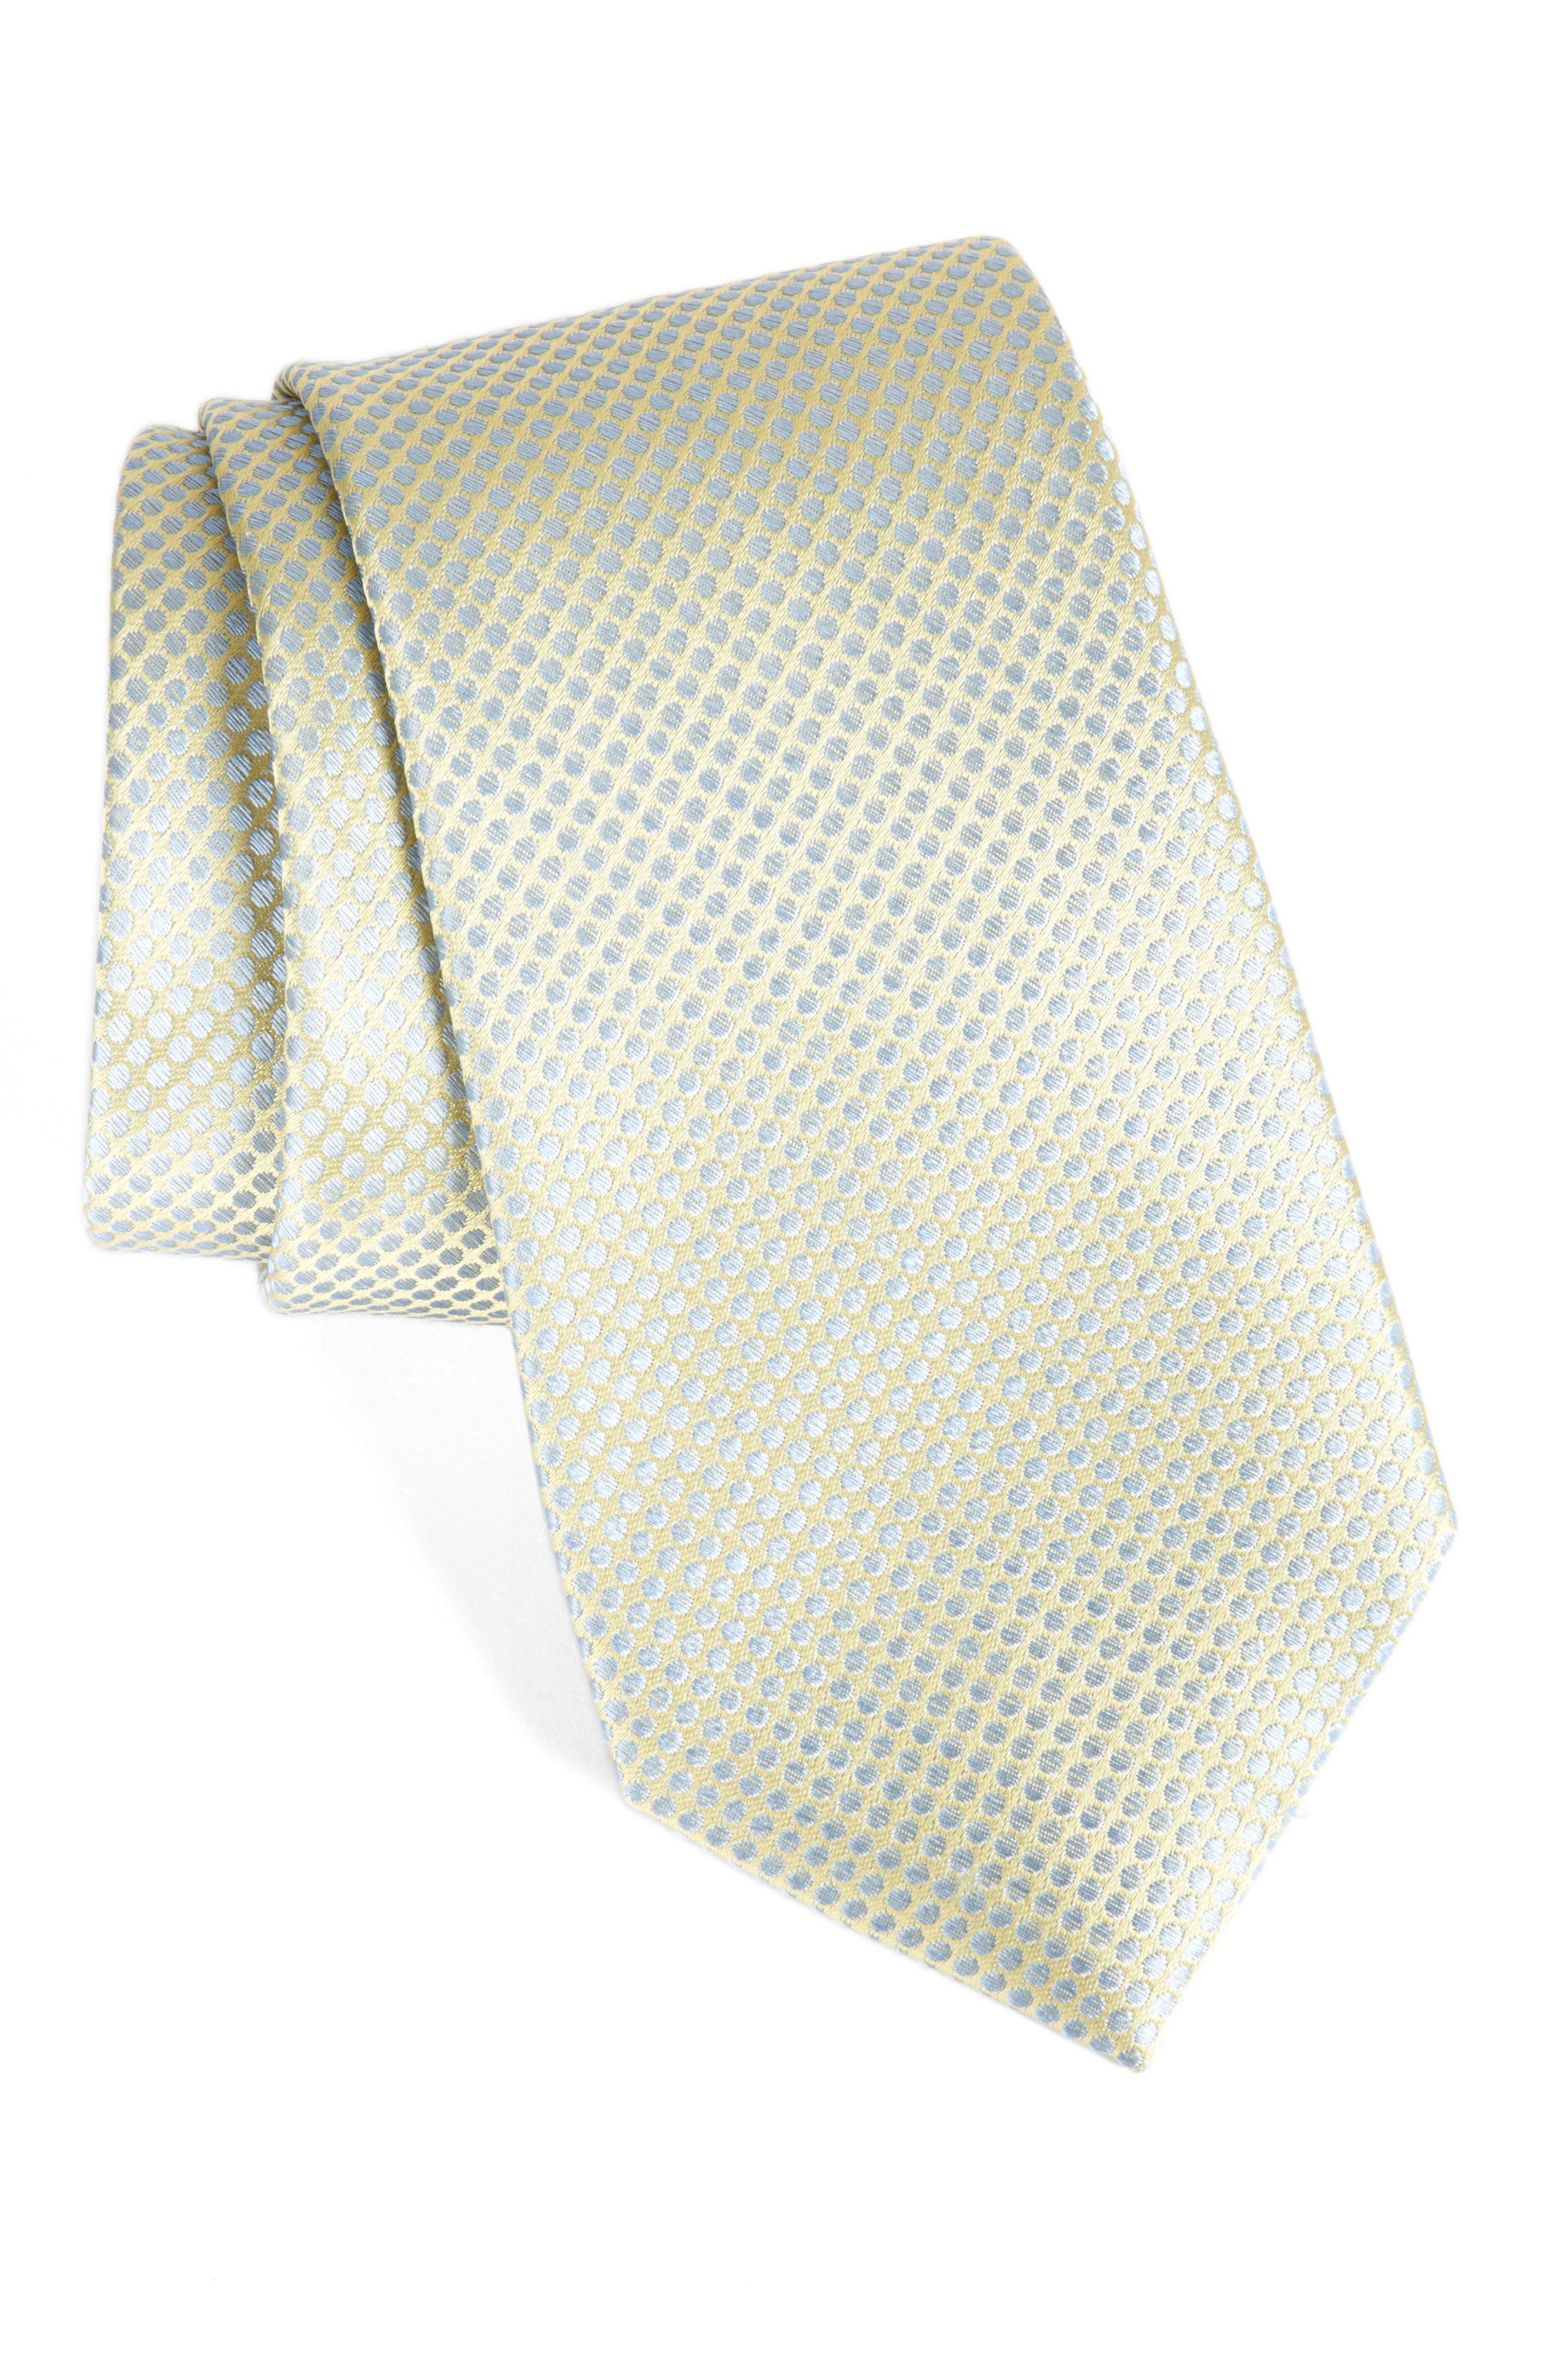 Main Image - Calibrate Saturated Dot Silk Tie